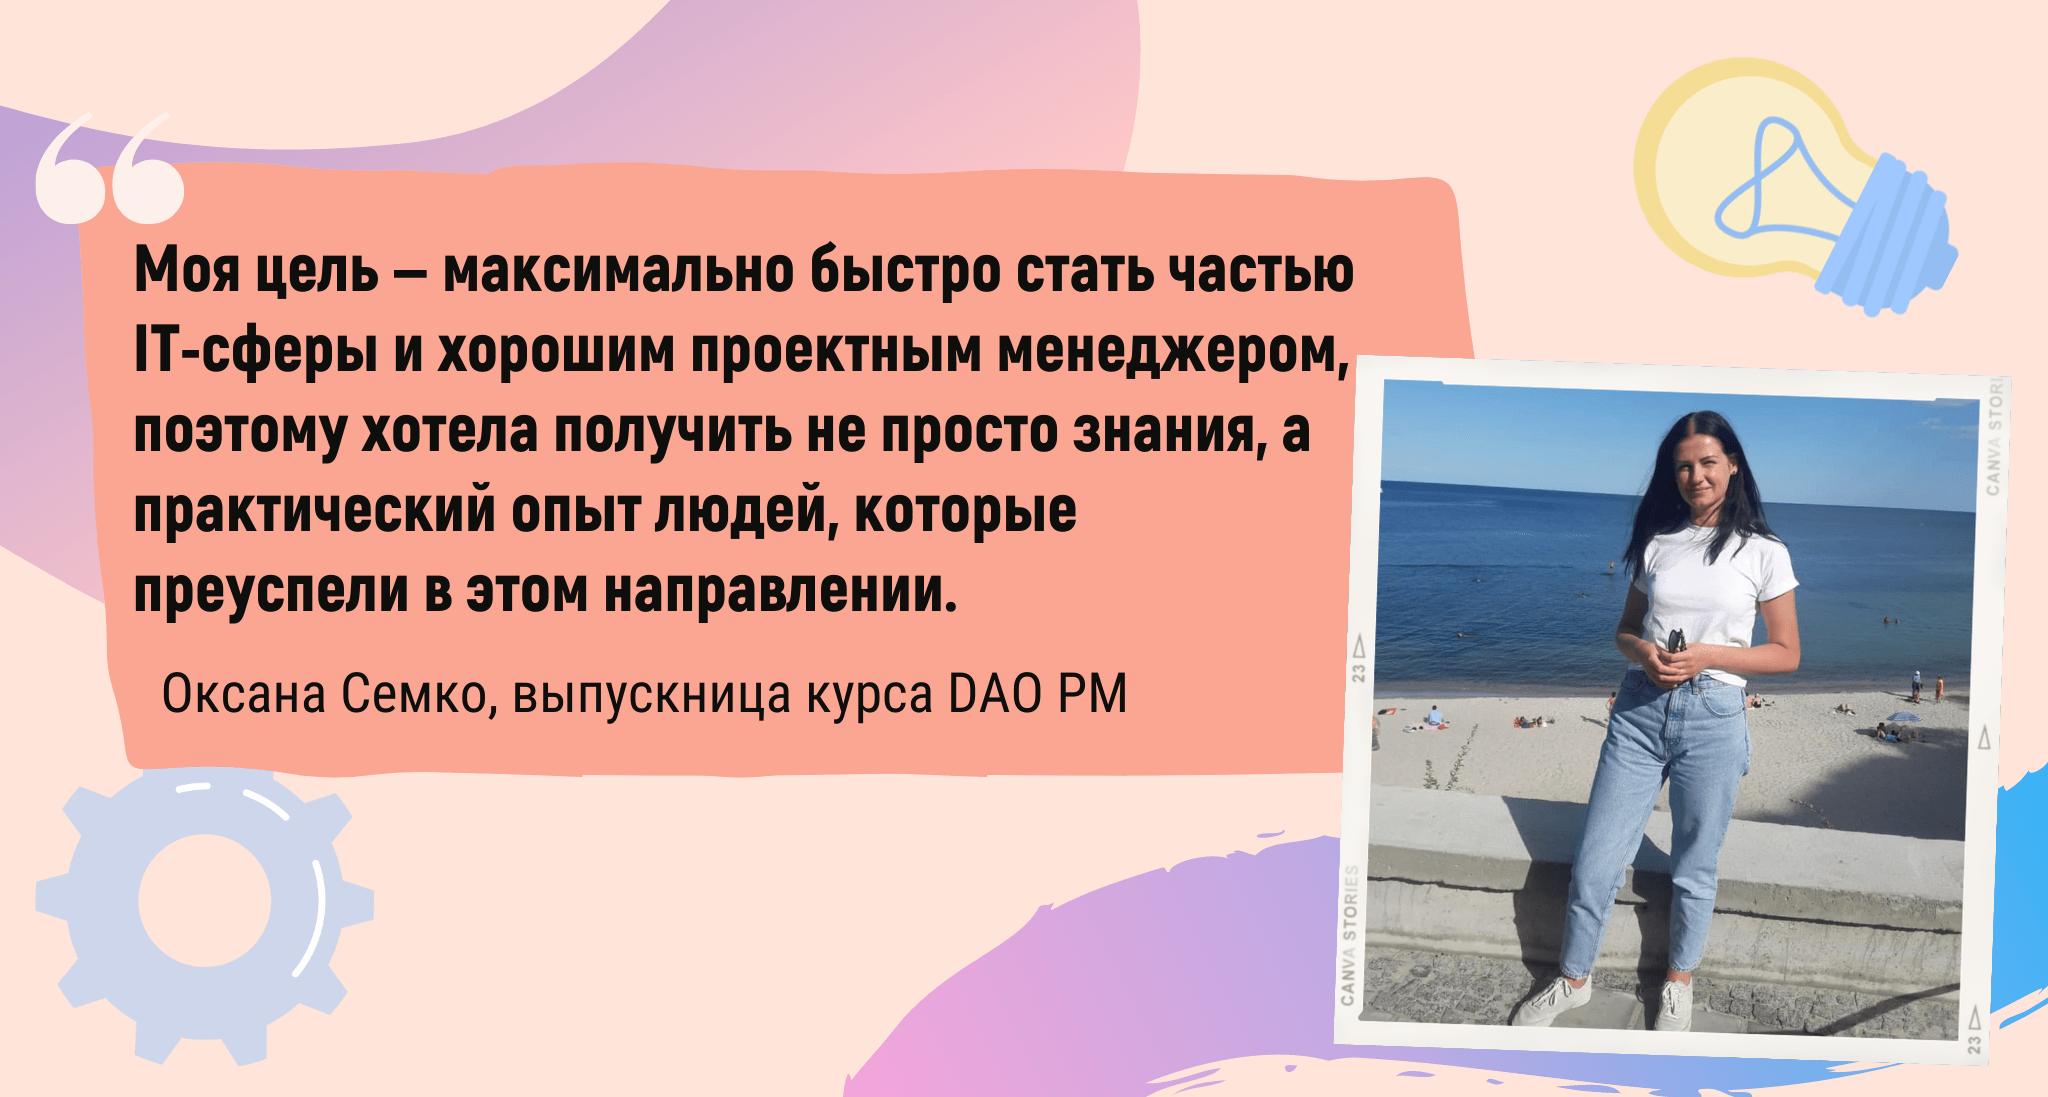 отзывы DAO PM 2